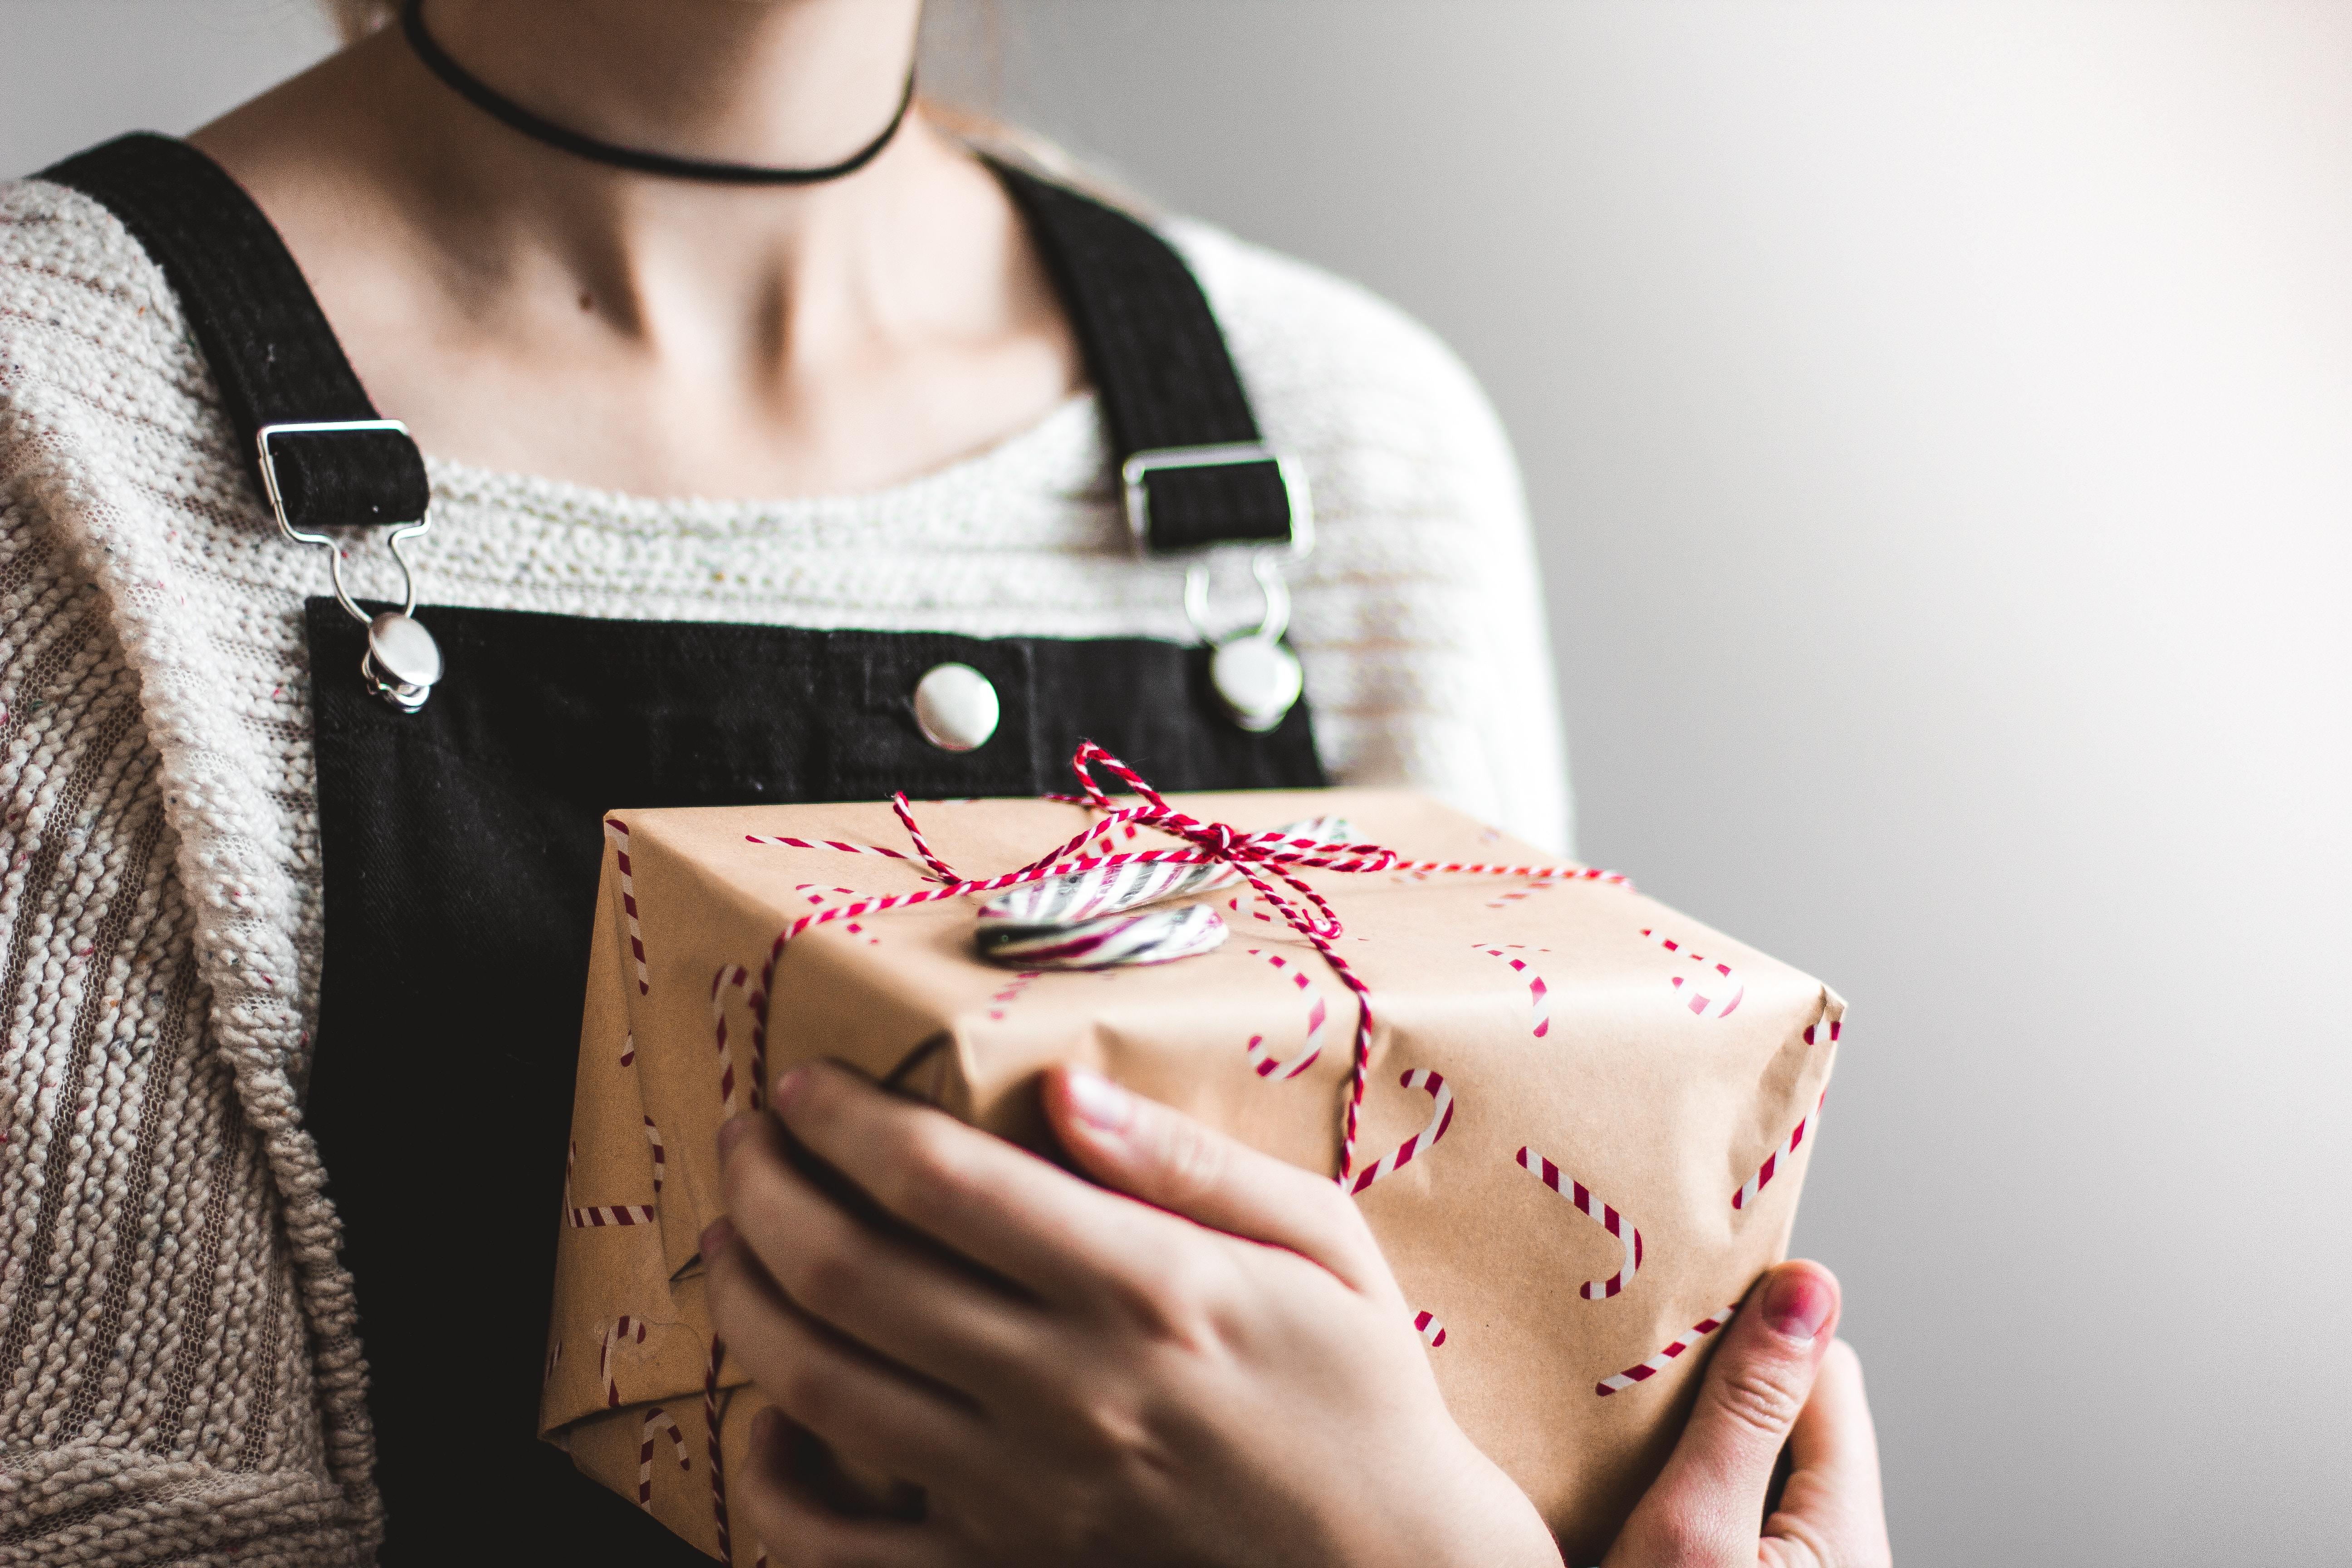 regalo, desiderio, sogno, Natale, tavola dei desideri